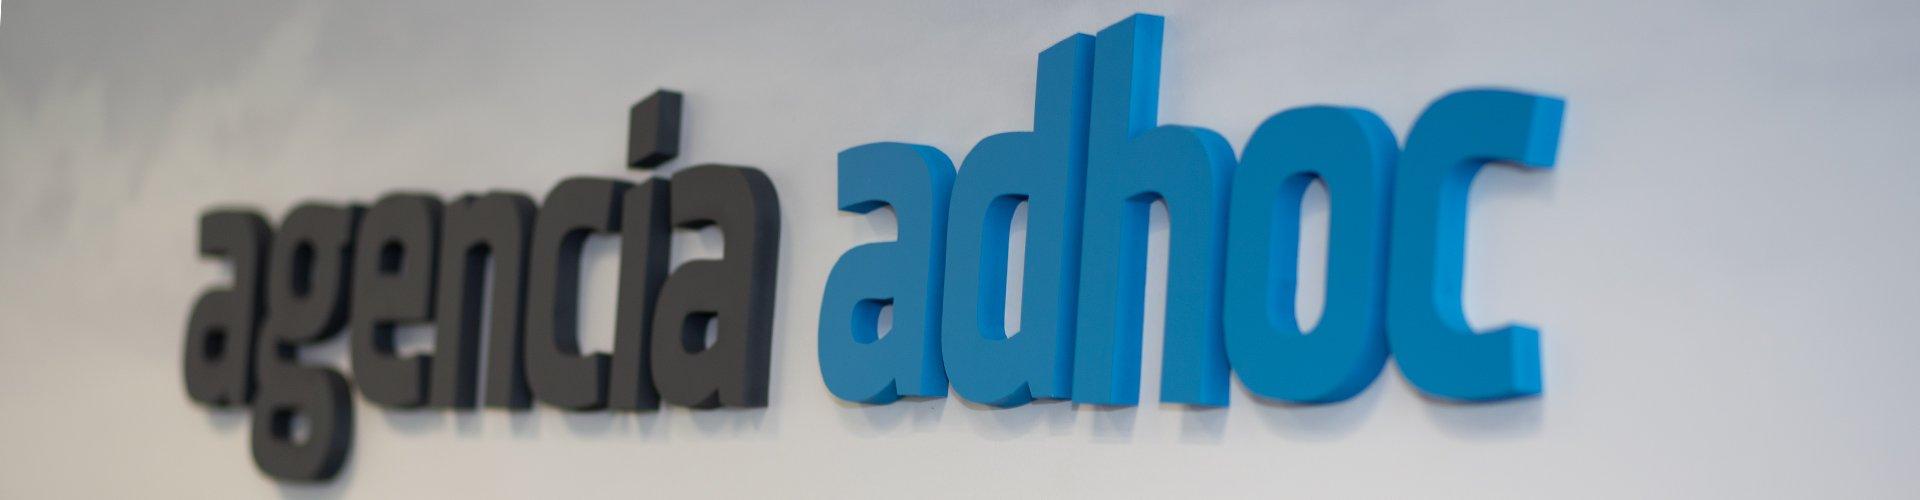 legalidad-web-agencia-adhoc